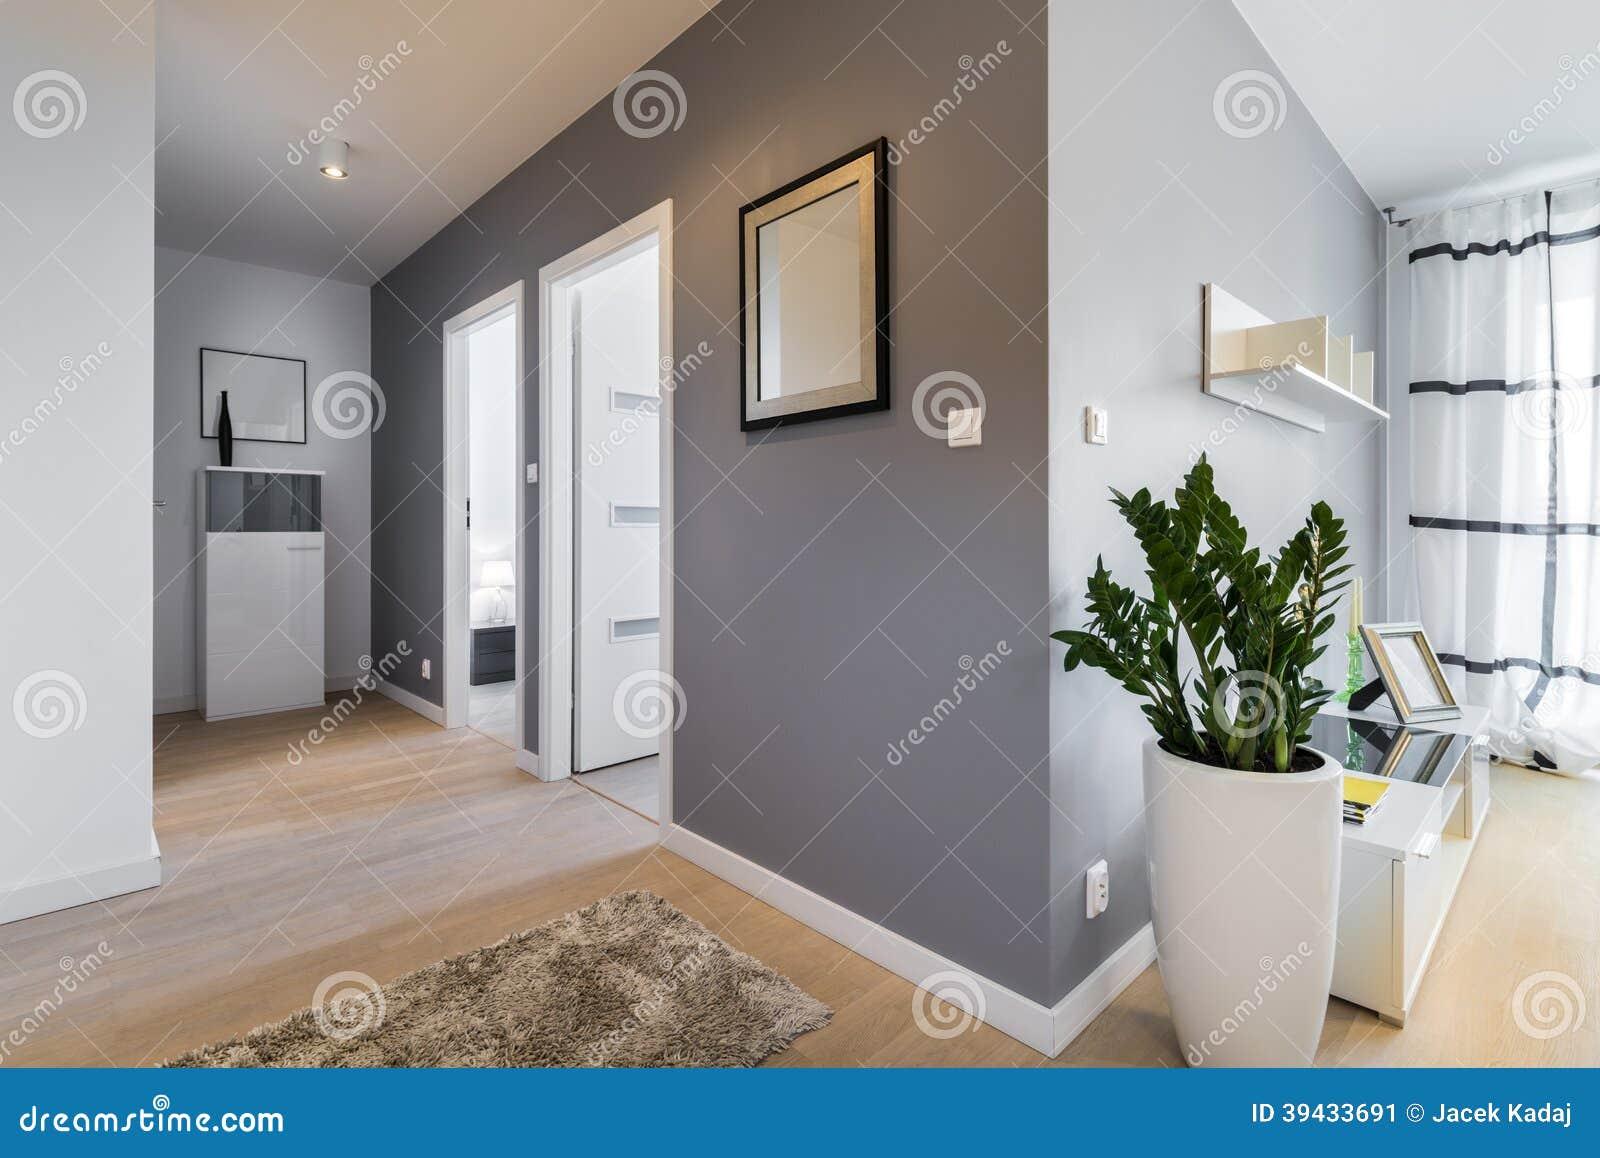 Decor simple and ideas on pinterest - Decoracion de apartamentos modernos ...